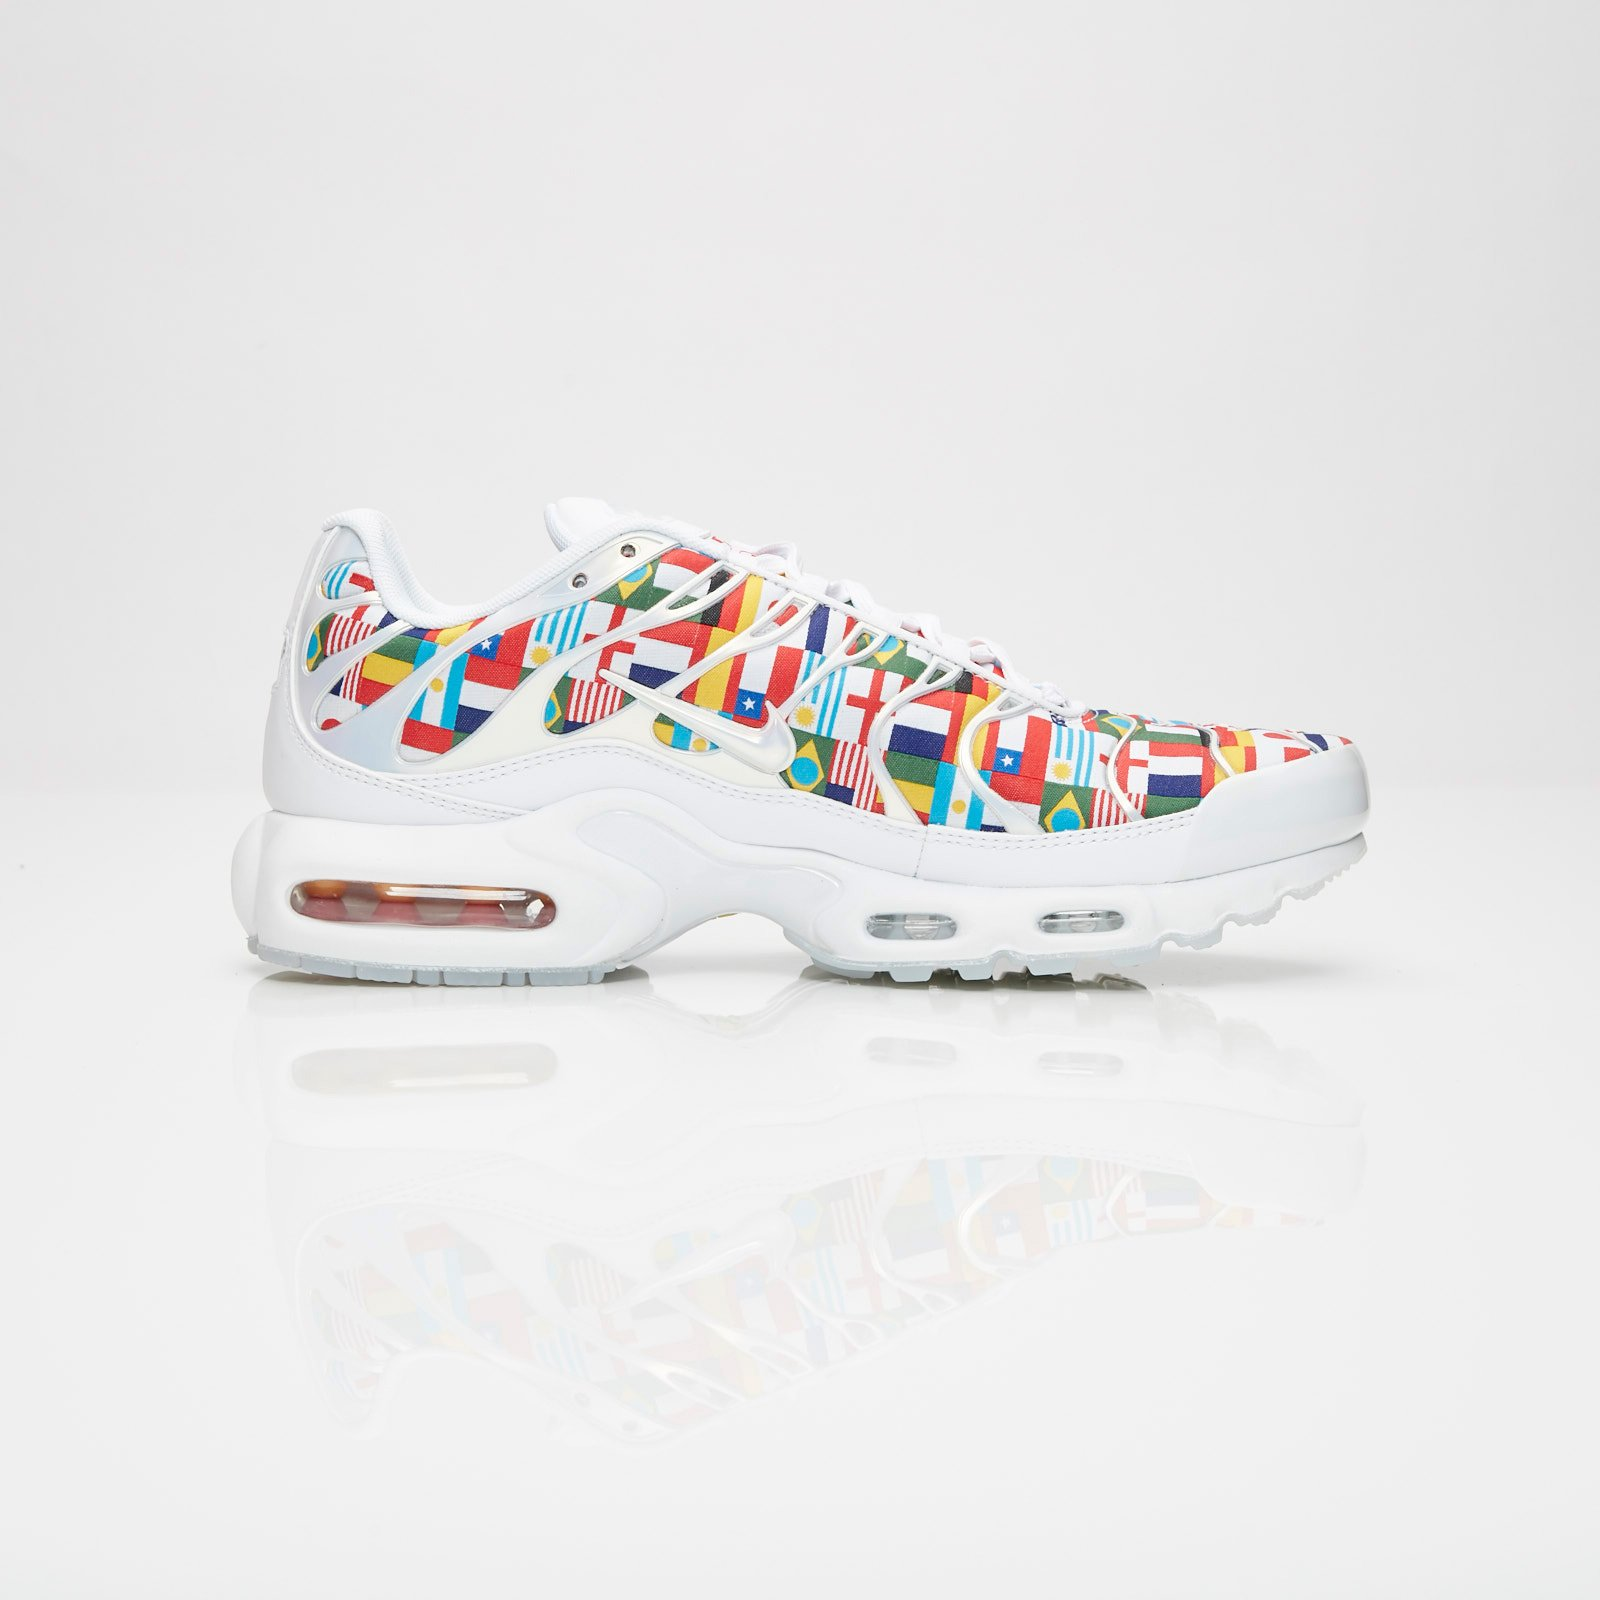 3a8e08ecaaf343 Nike Air Max Plus NIC QS - Ao5117-100 - Sneakersnstuff